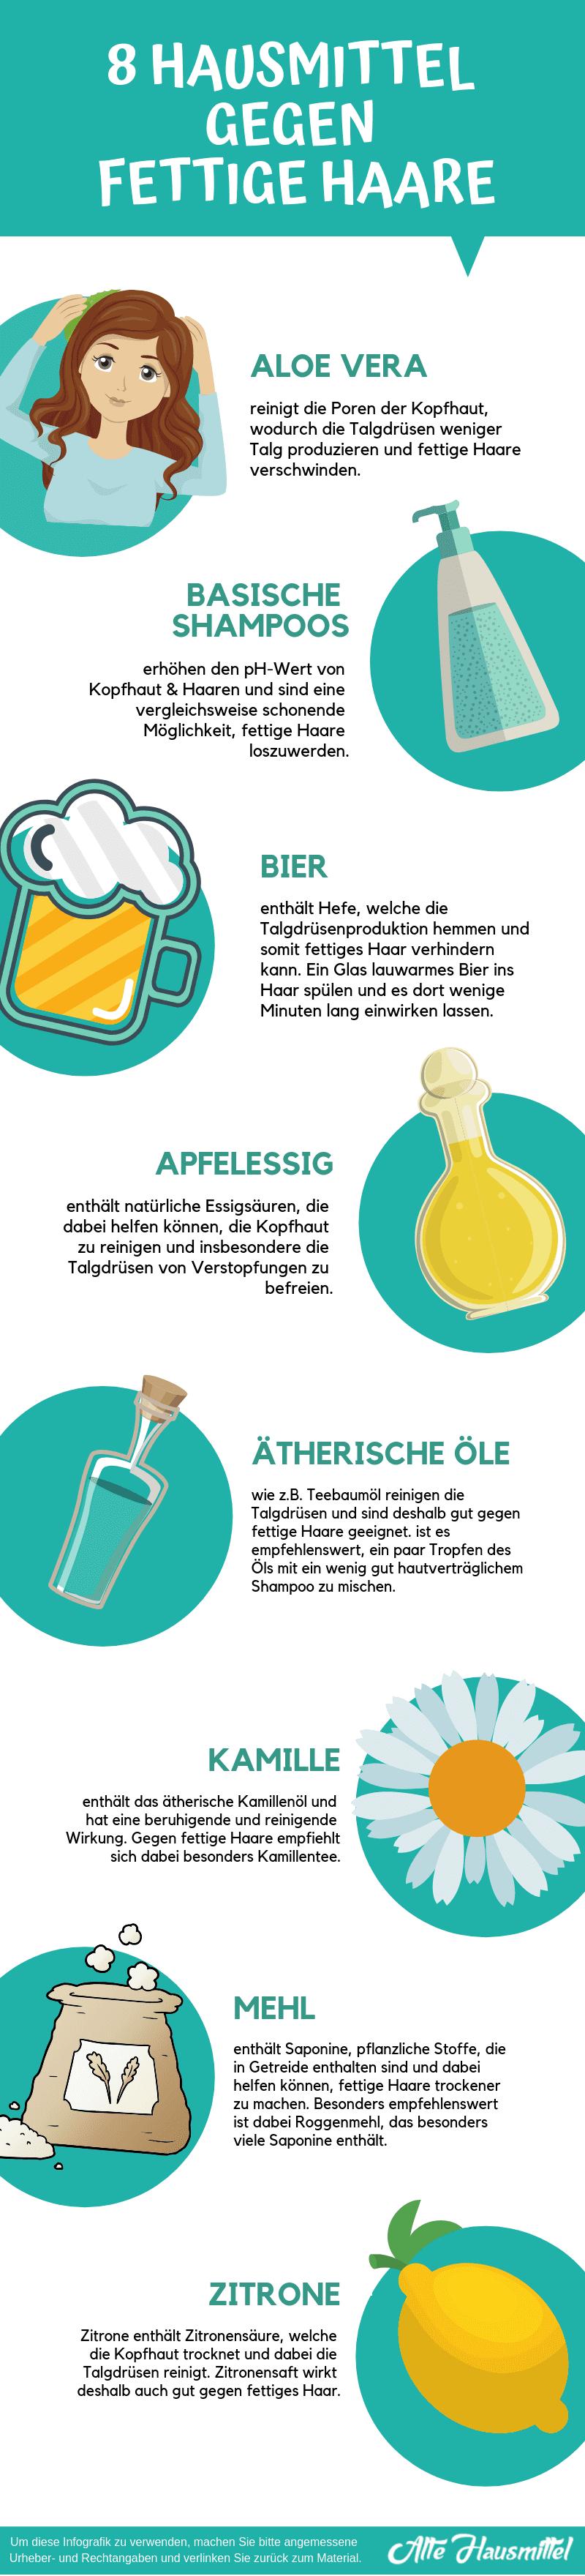 Hausmittel gegen fettige Haare Infografik